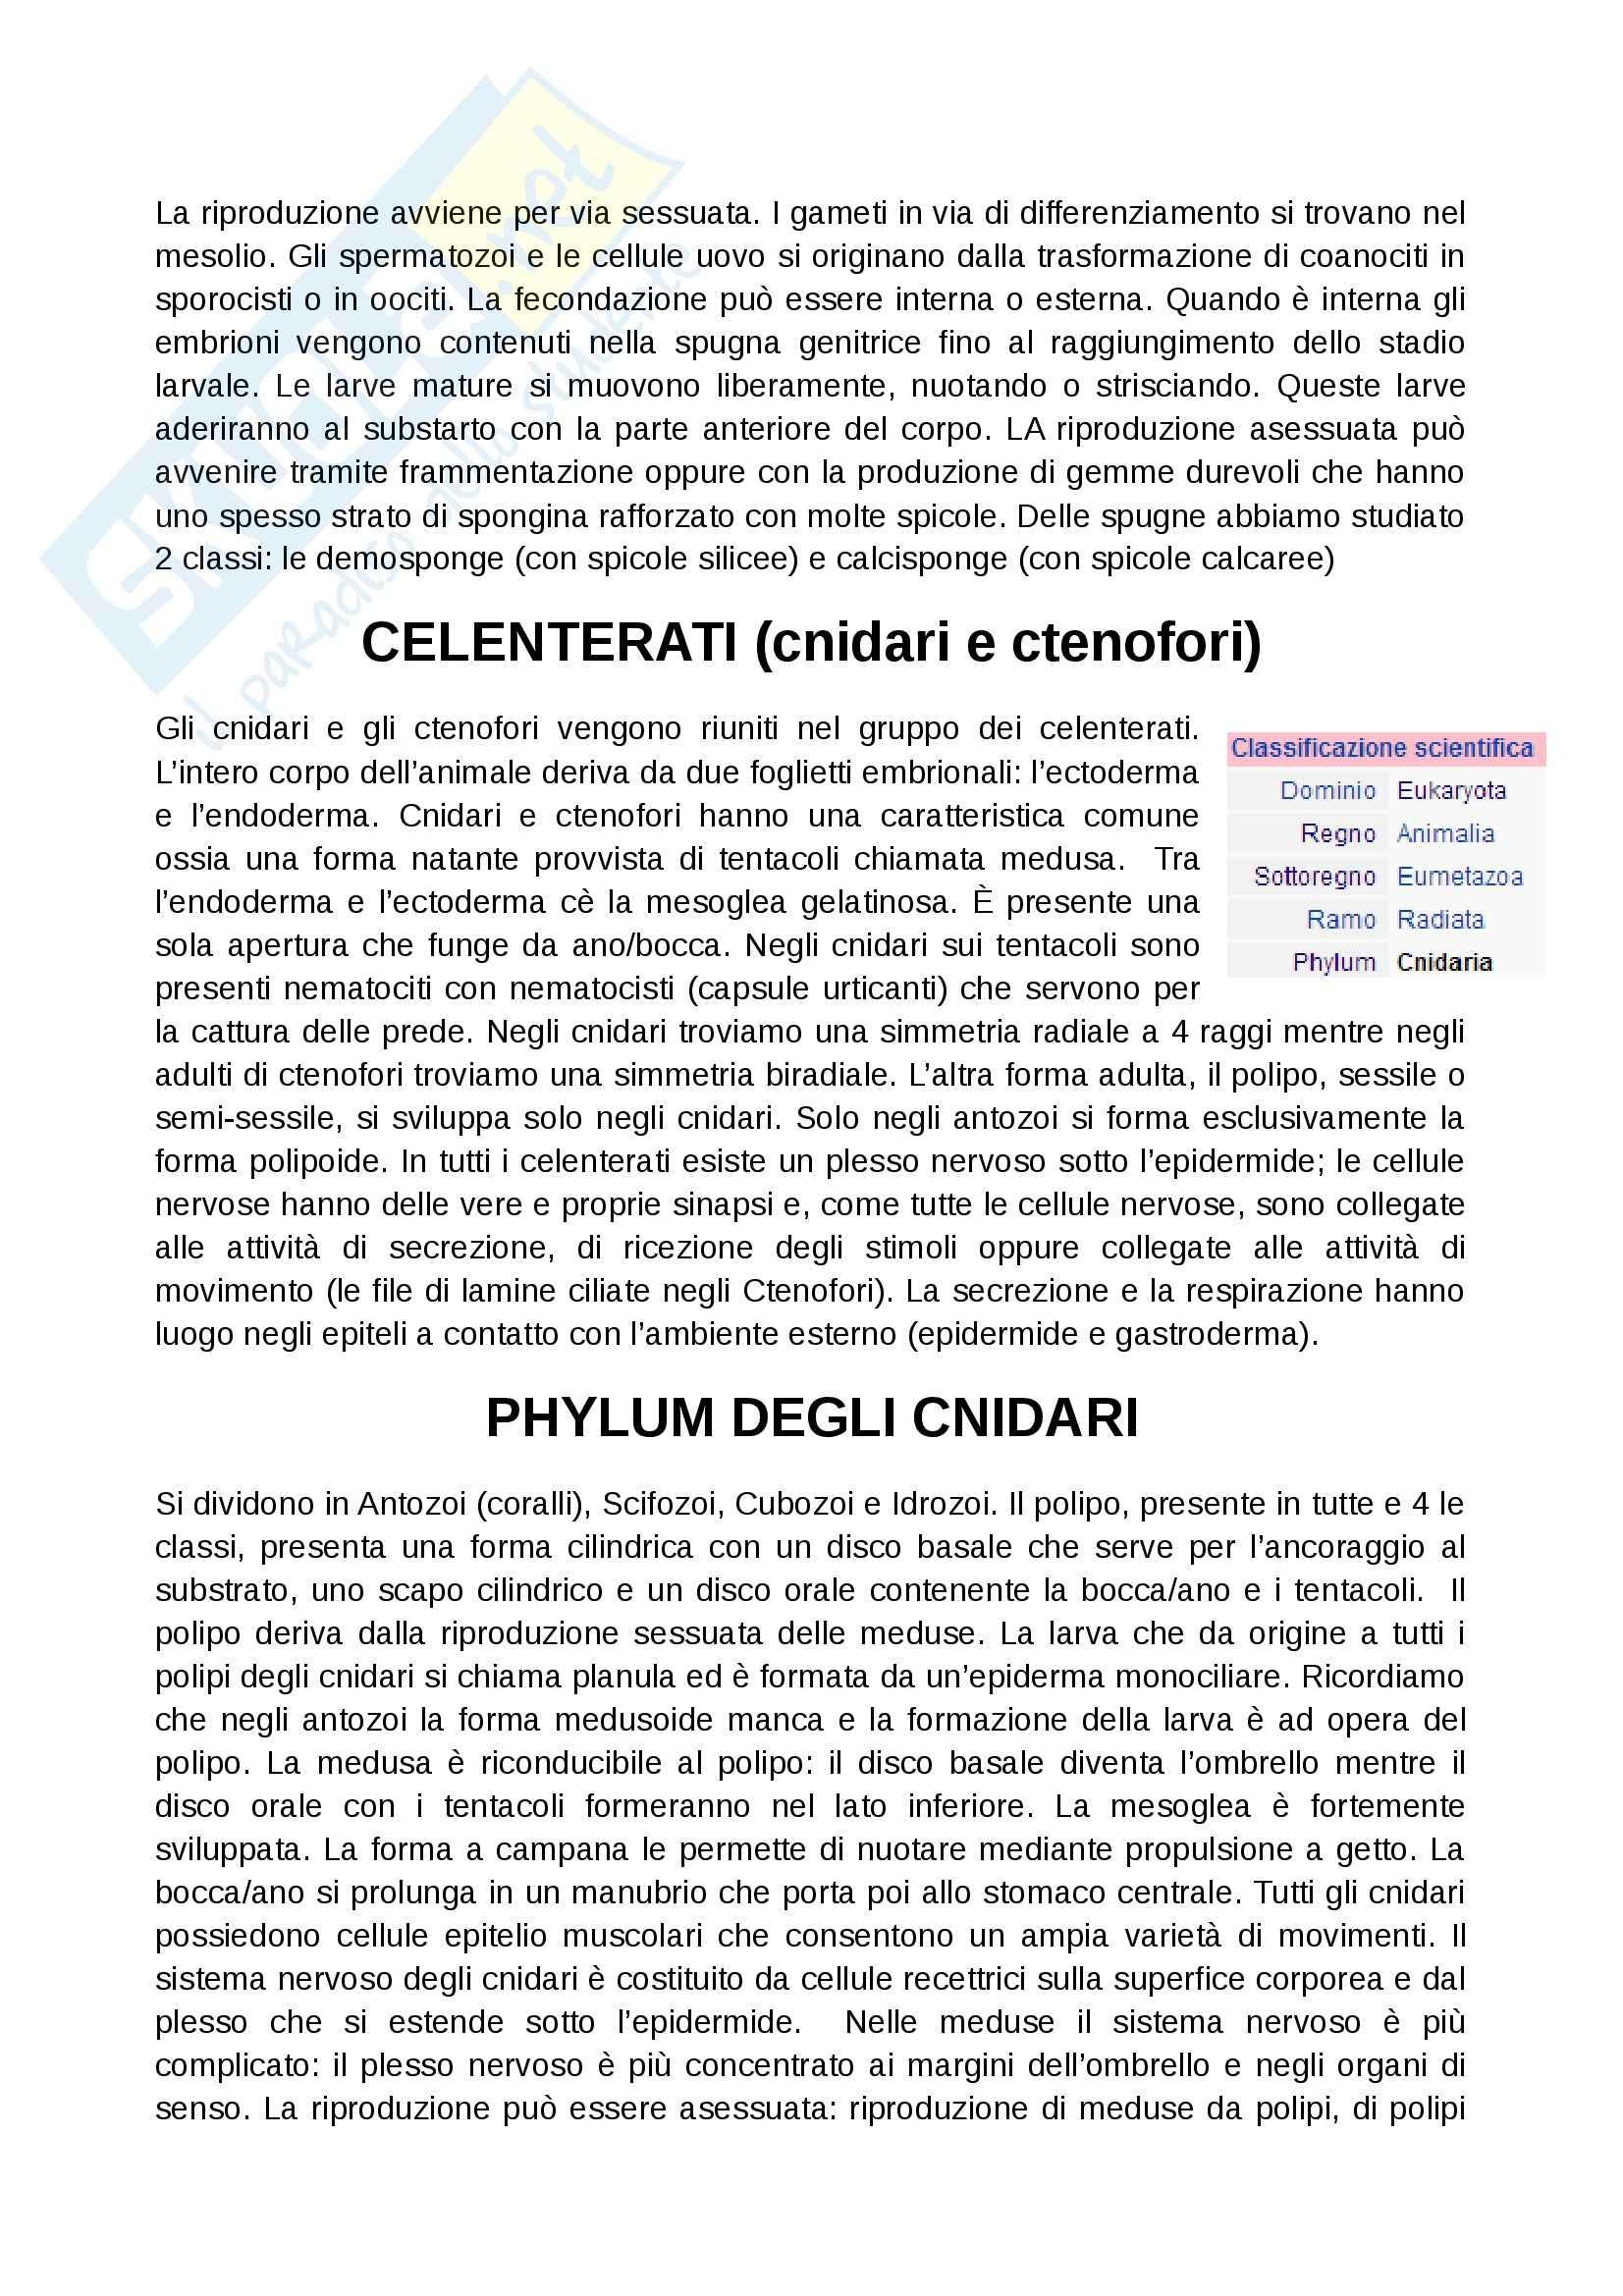 Zoologia  - Appunti Pag. 2